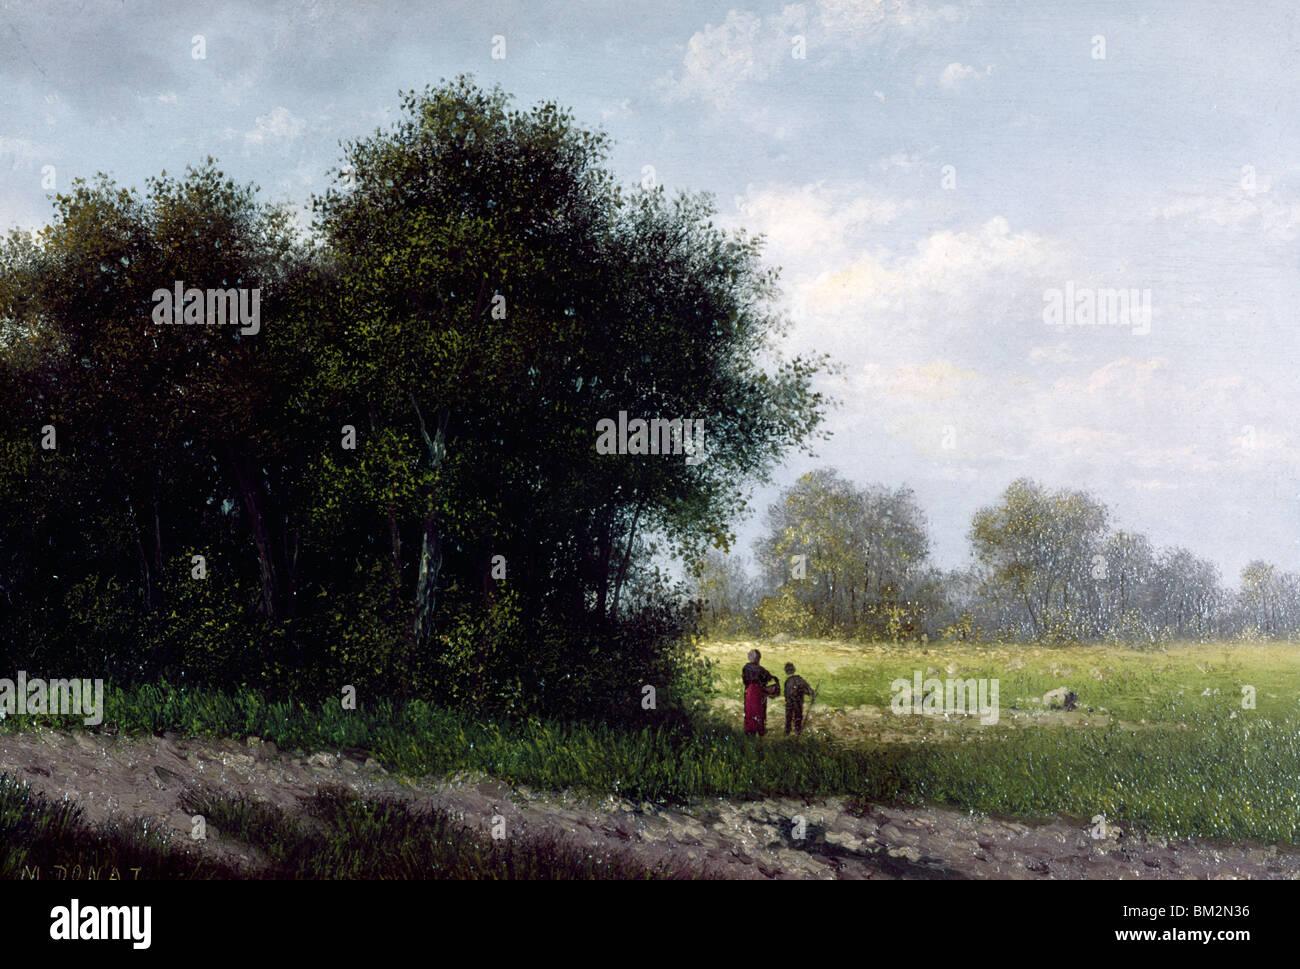 Barbizon Landscape by M. Donat,  oil on wood,  19th century,  USA,  Pennsylvania,  Philadelphia,  David David Gallery - Stock Image